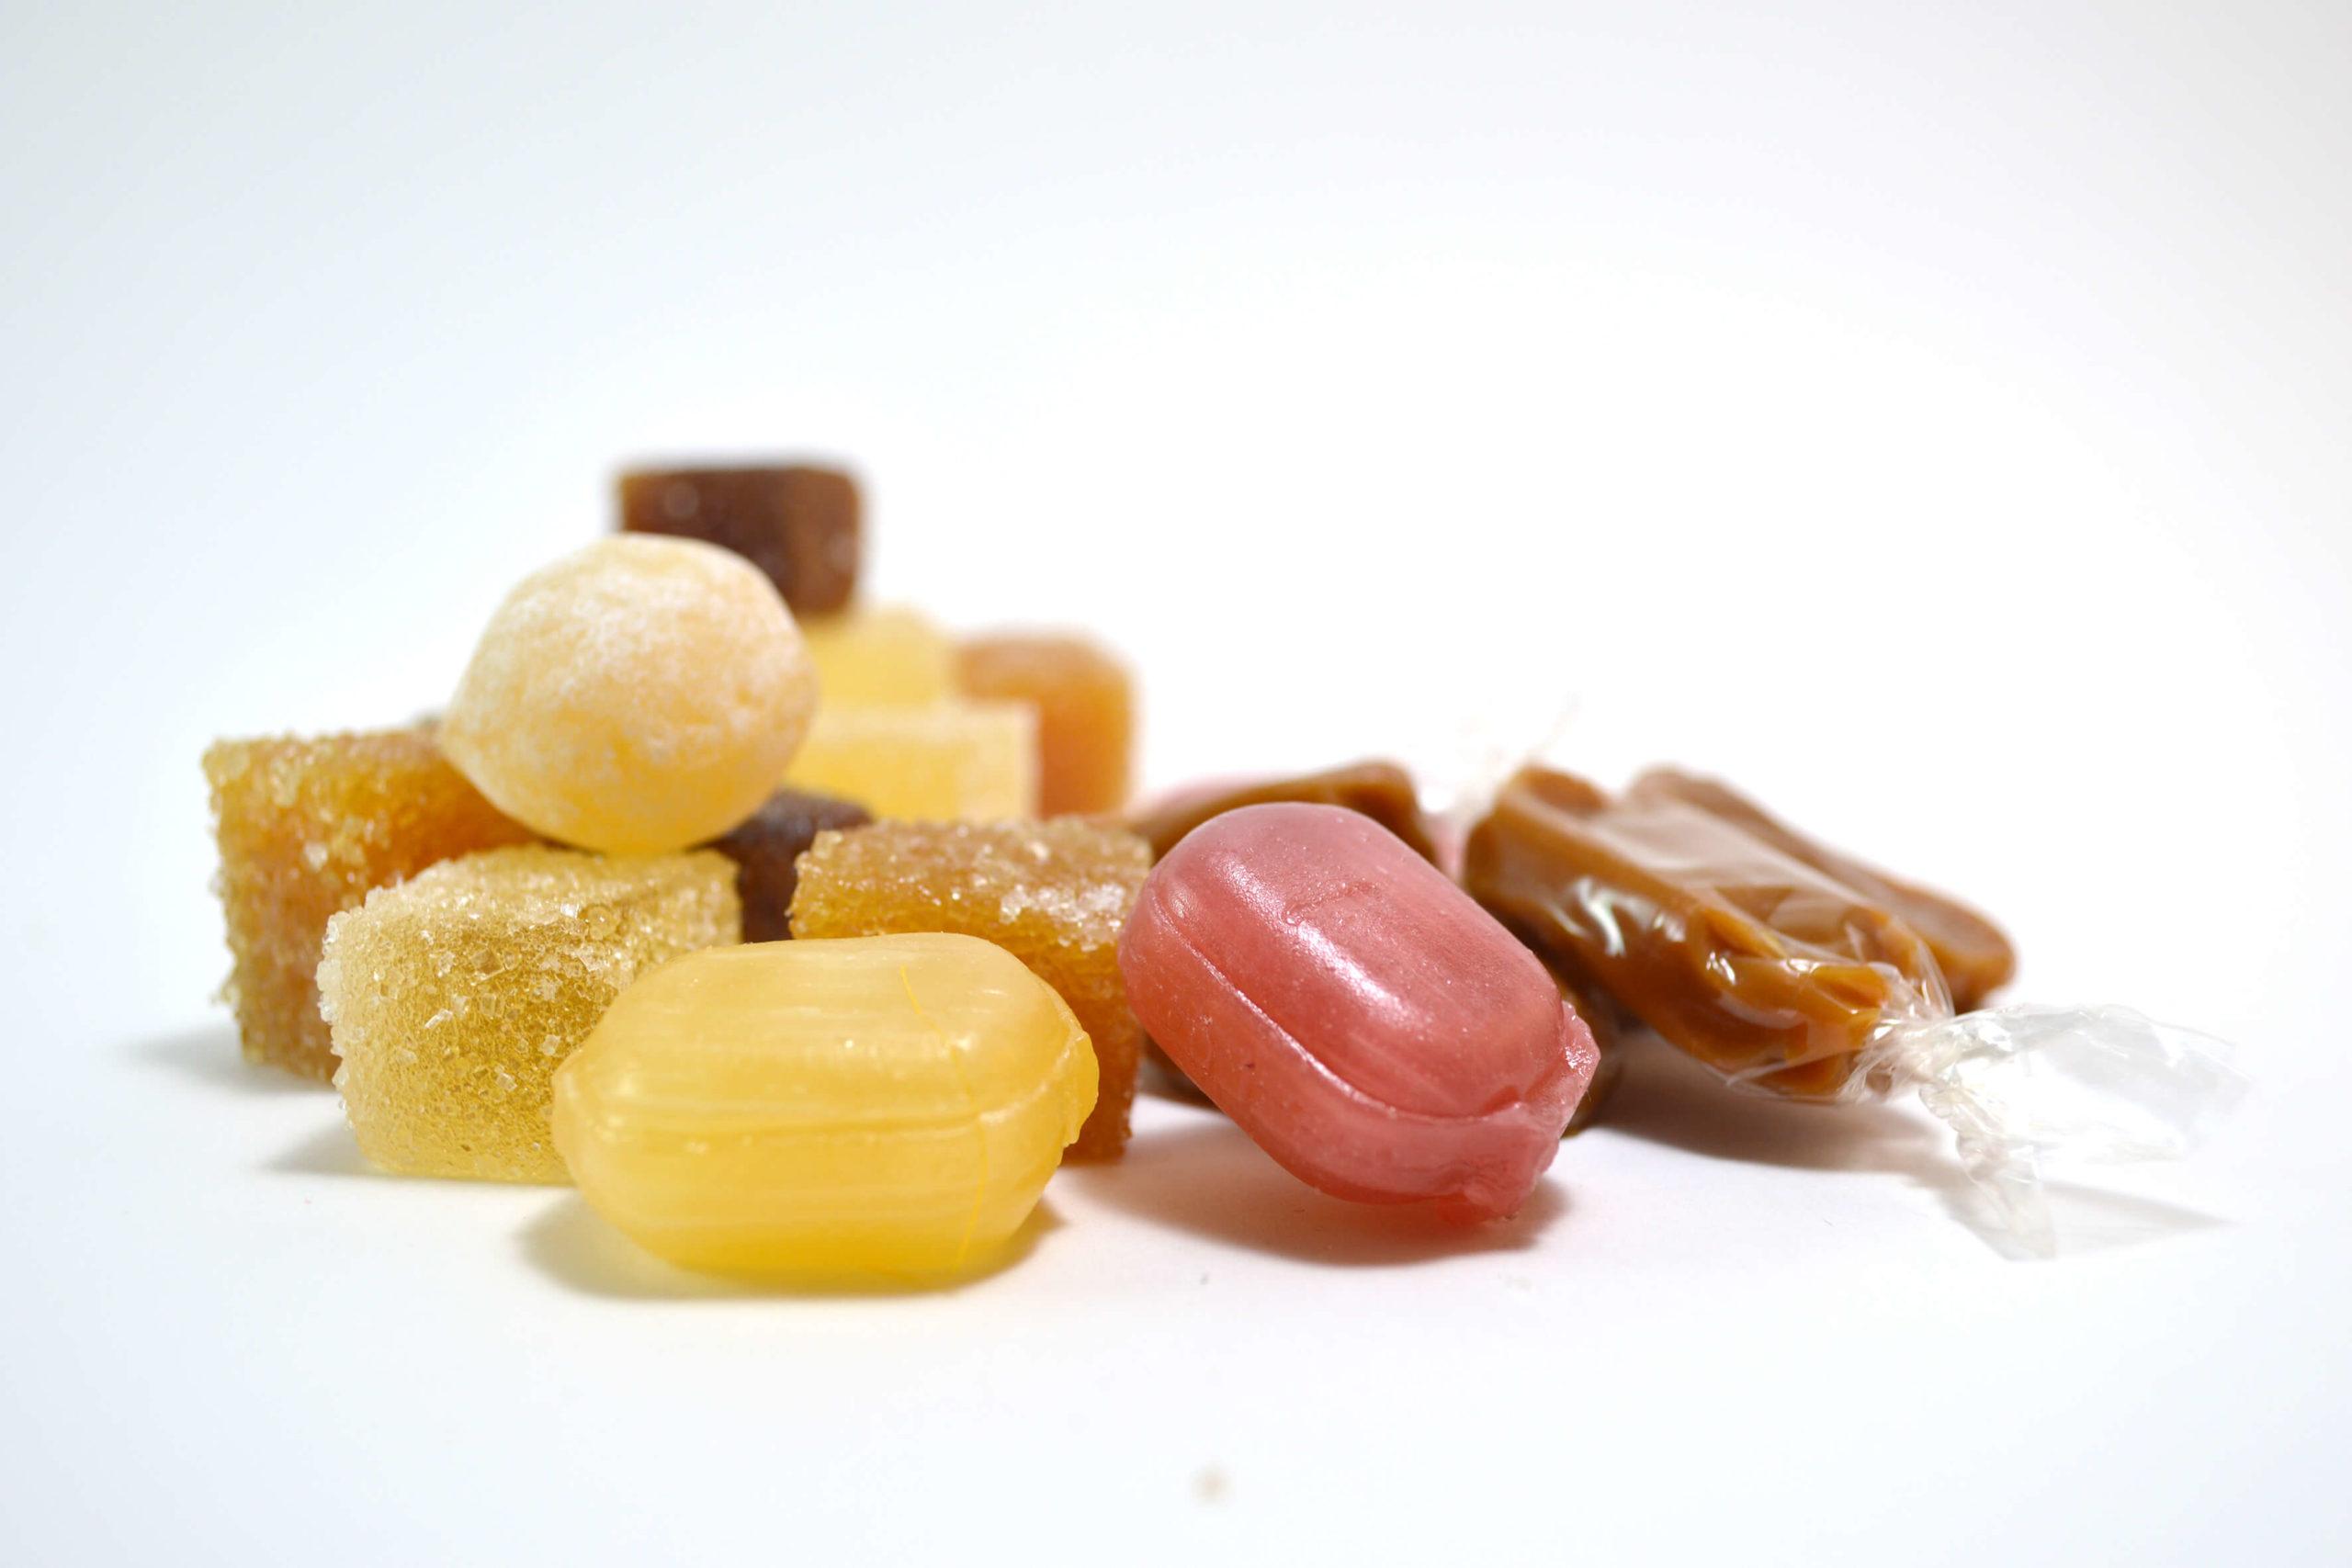 bonbons artisanaux la reine friande